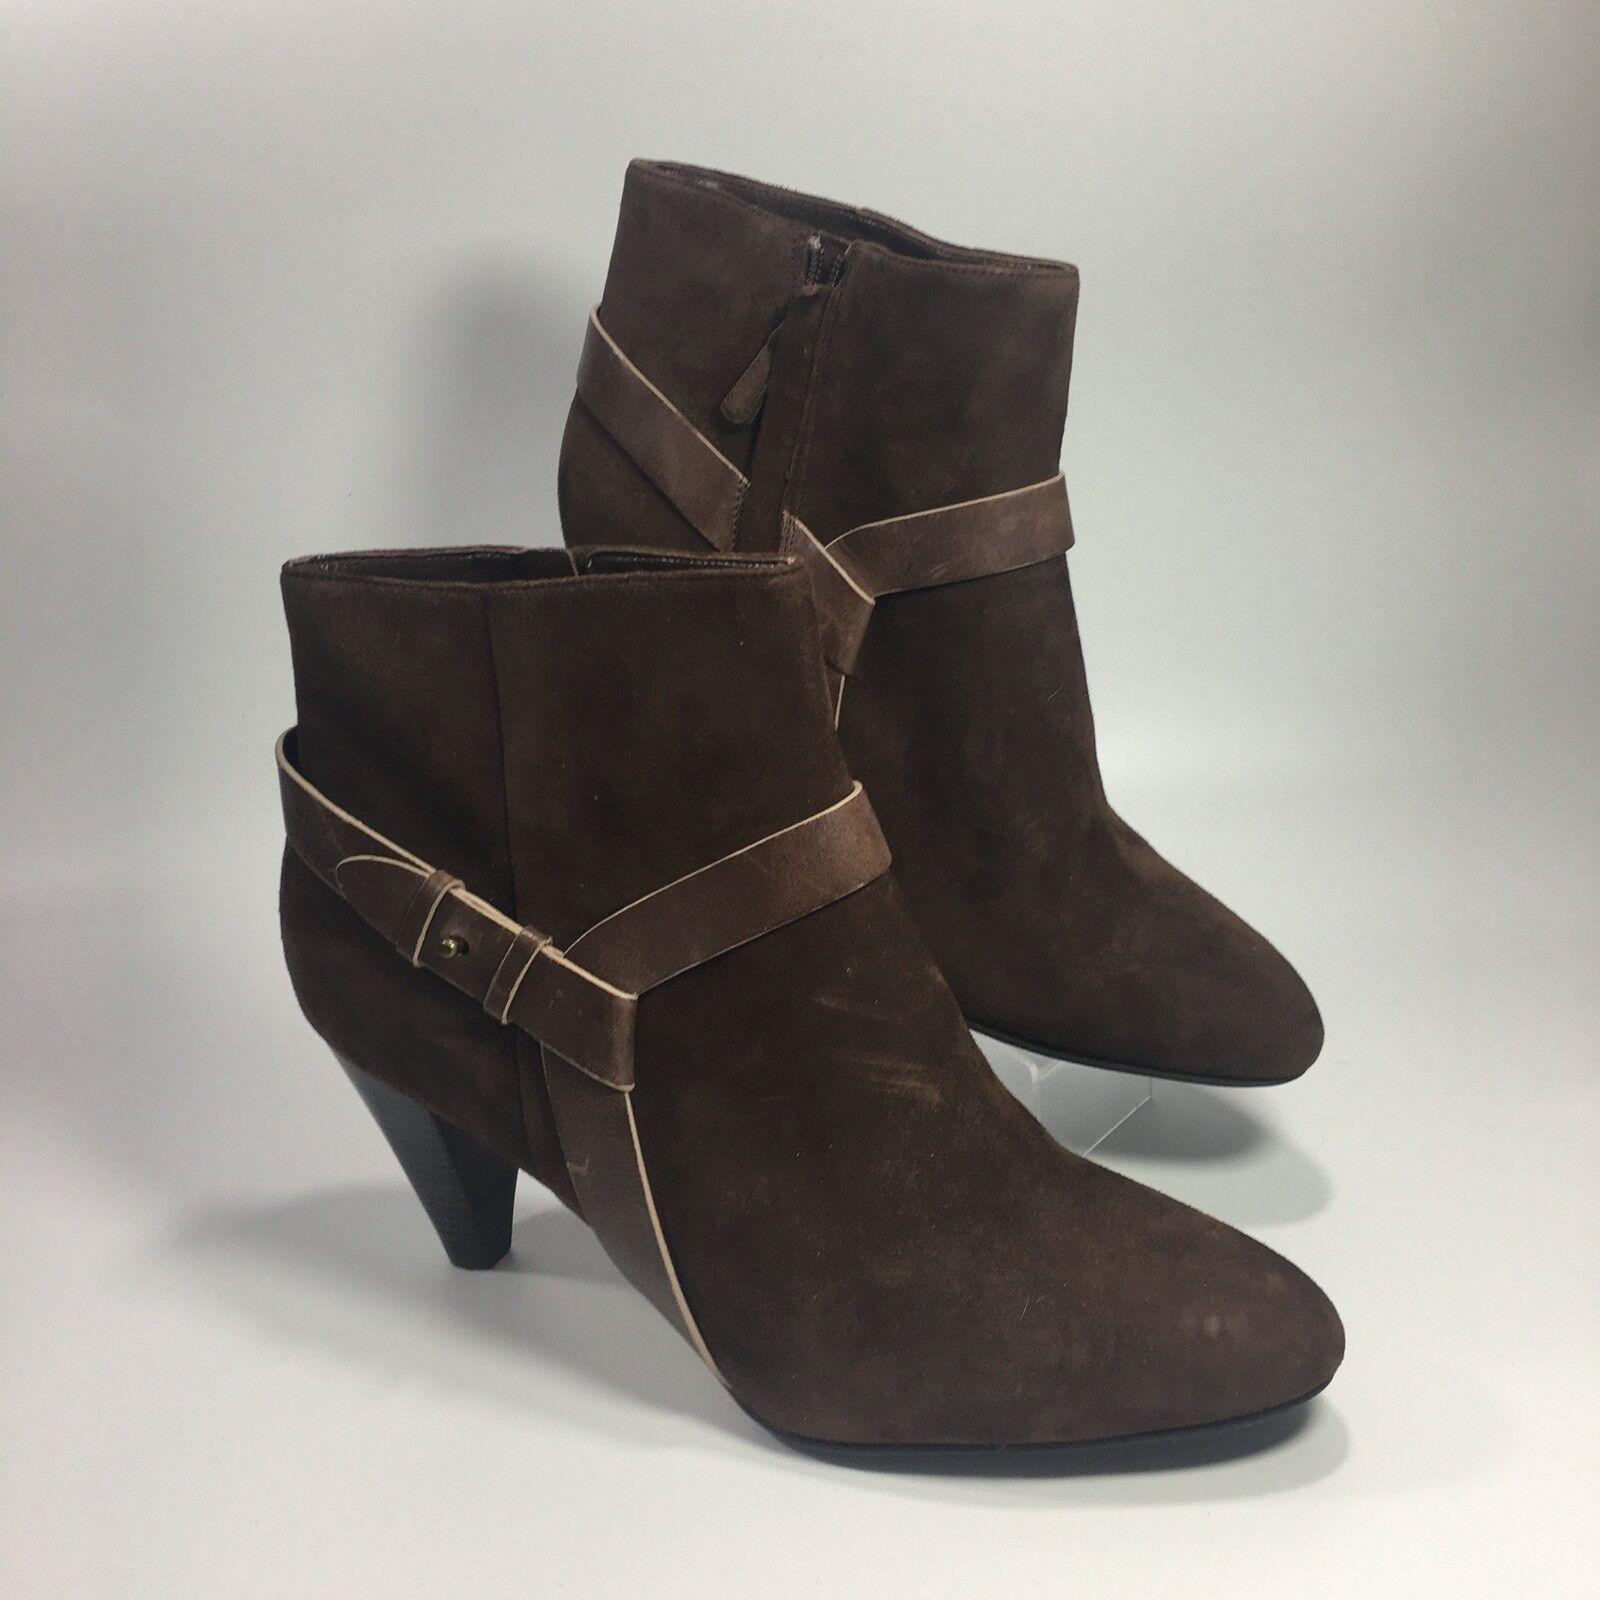 NEU Cole Haan Damens's Braun Suede Leder Heel Ankle Booties Stiefel Sz 10.5 B